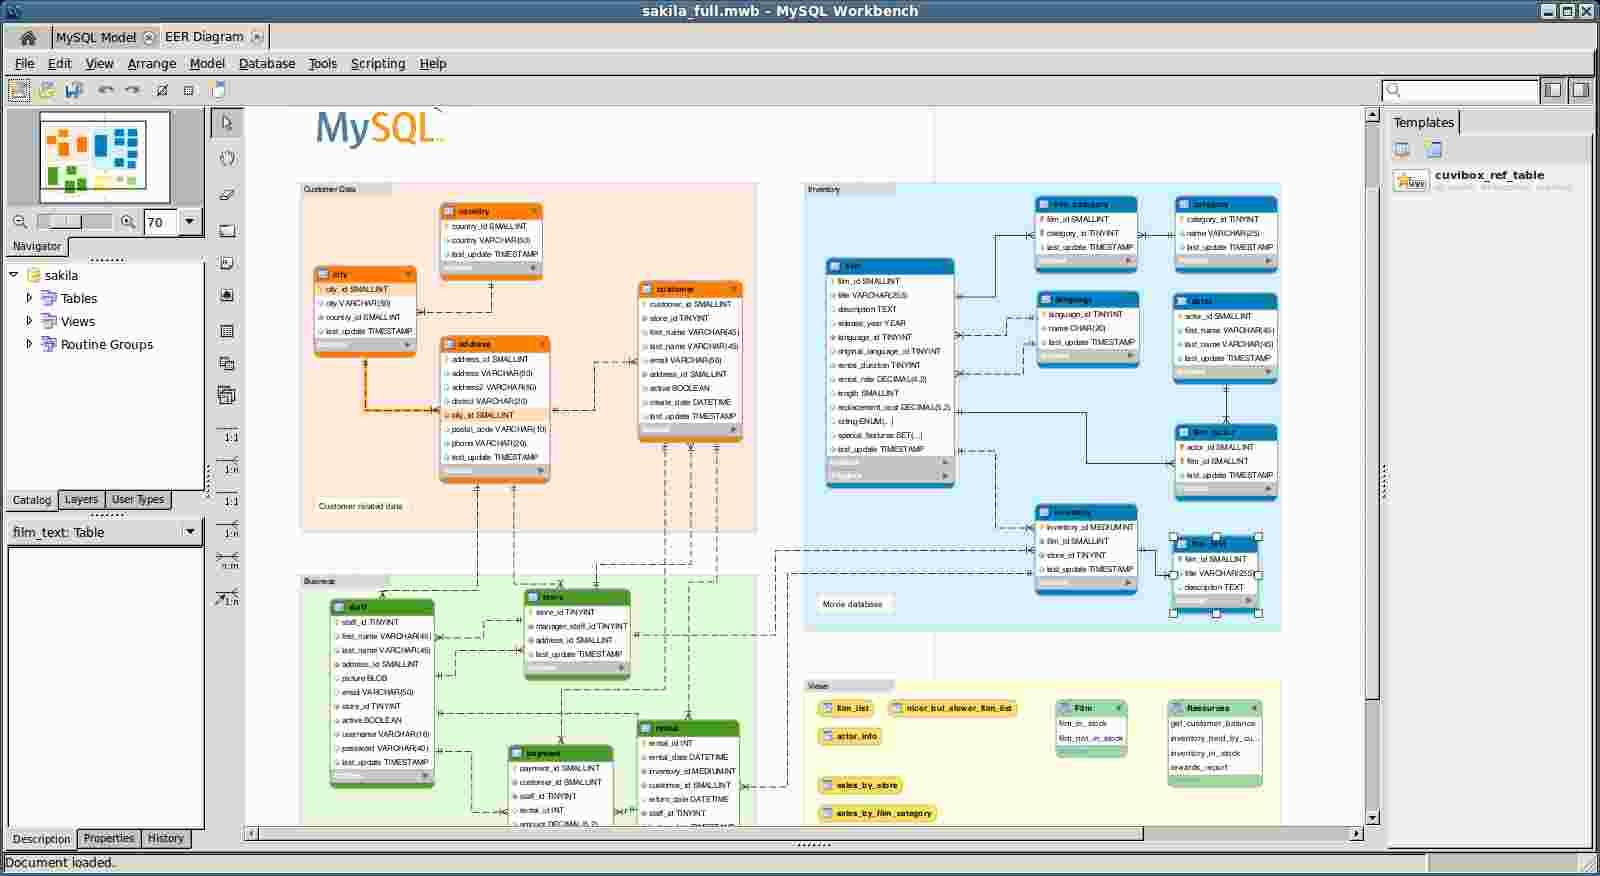 Mysql open source modelling tools proavan sakilafullb mysql workbench001 ccuart Choice Image